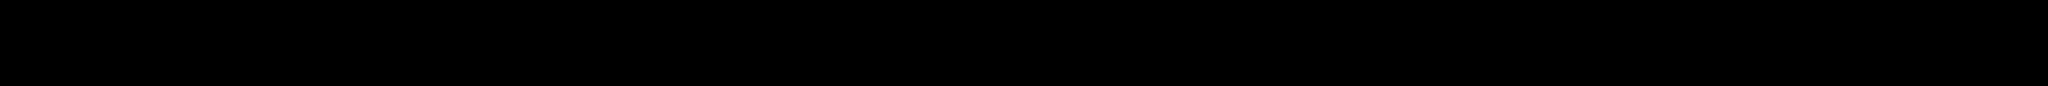 MODECOM Navigationssystem